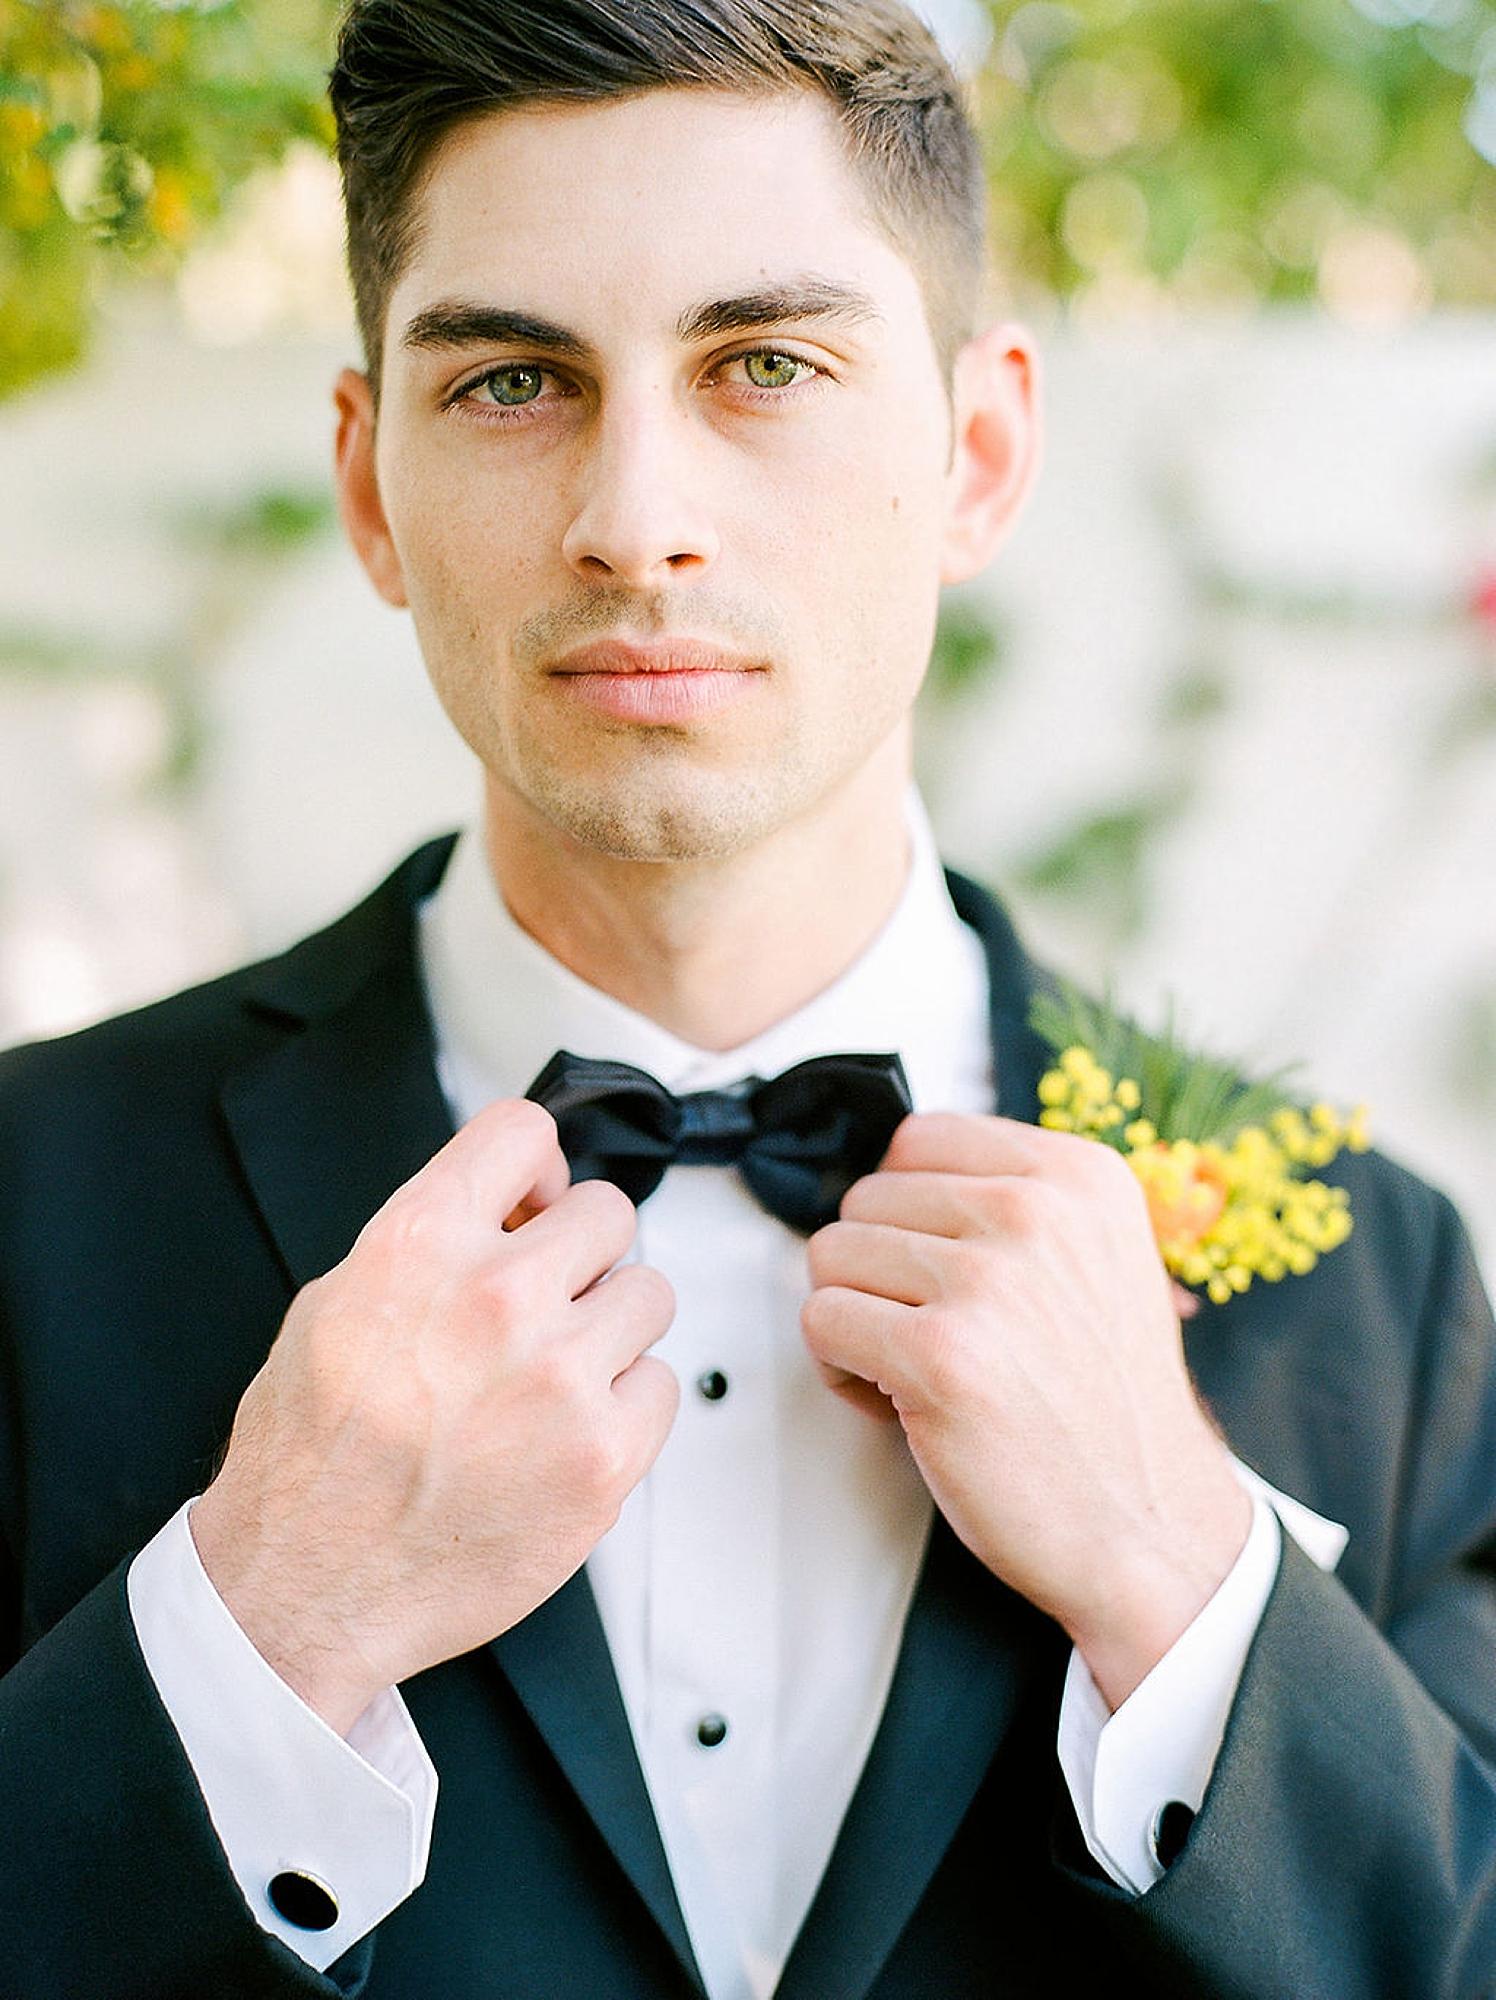 El Chorro Sedona AZ Wedding Photography by Magi Fisher of Magdalena Studios 0011